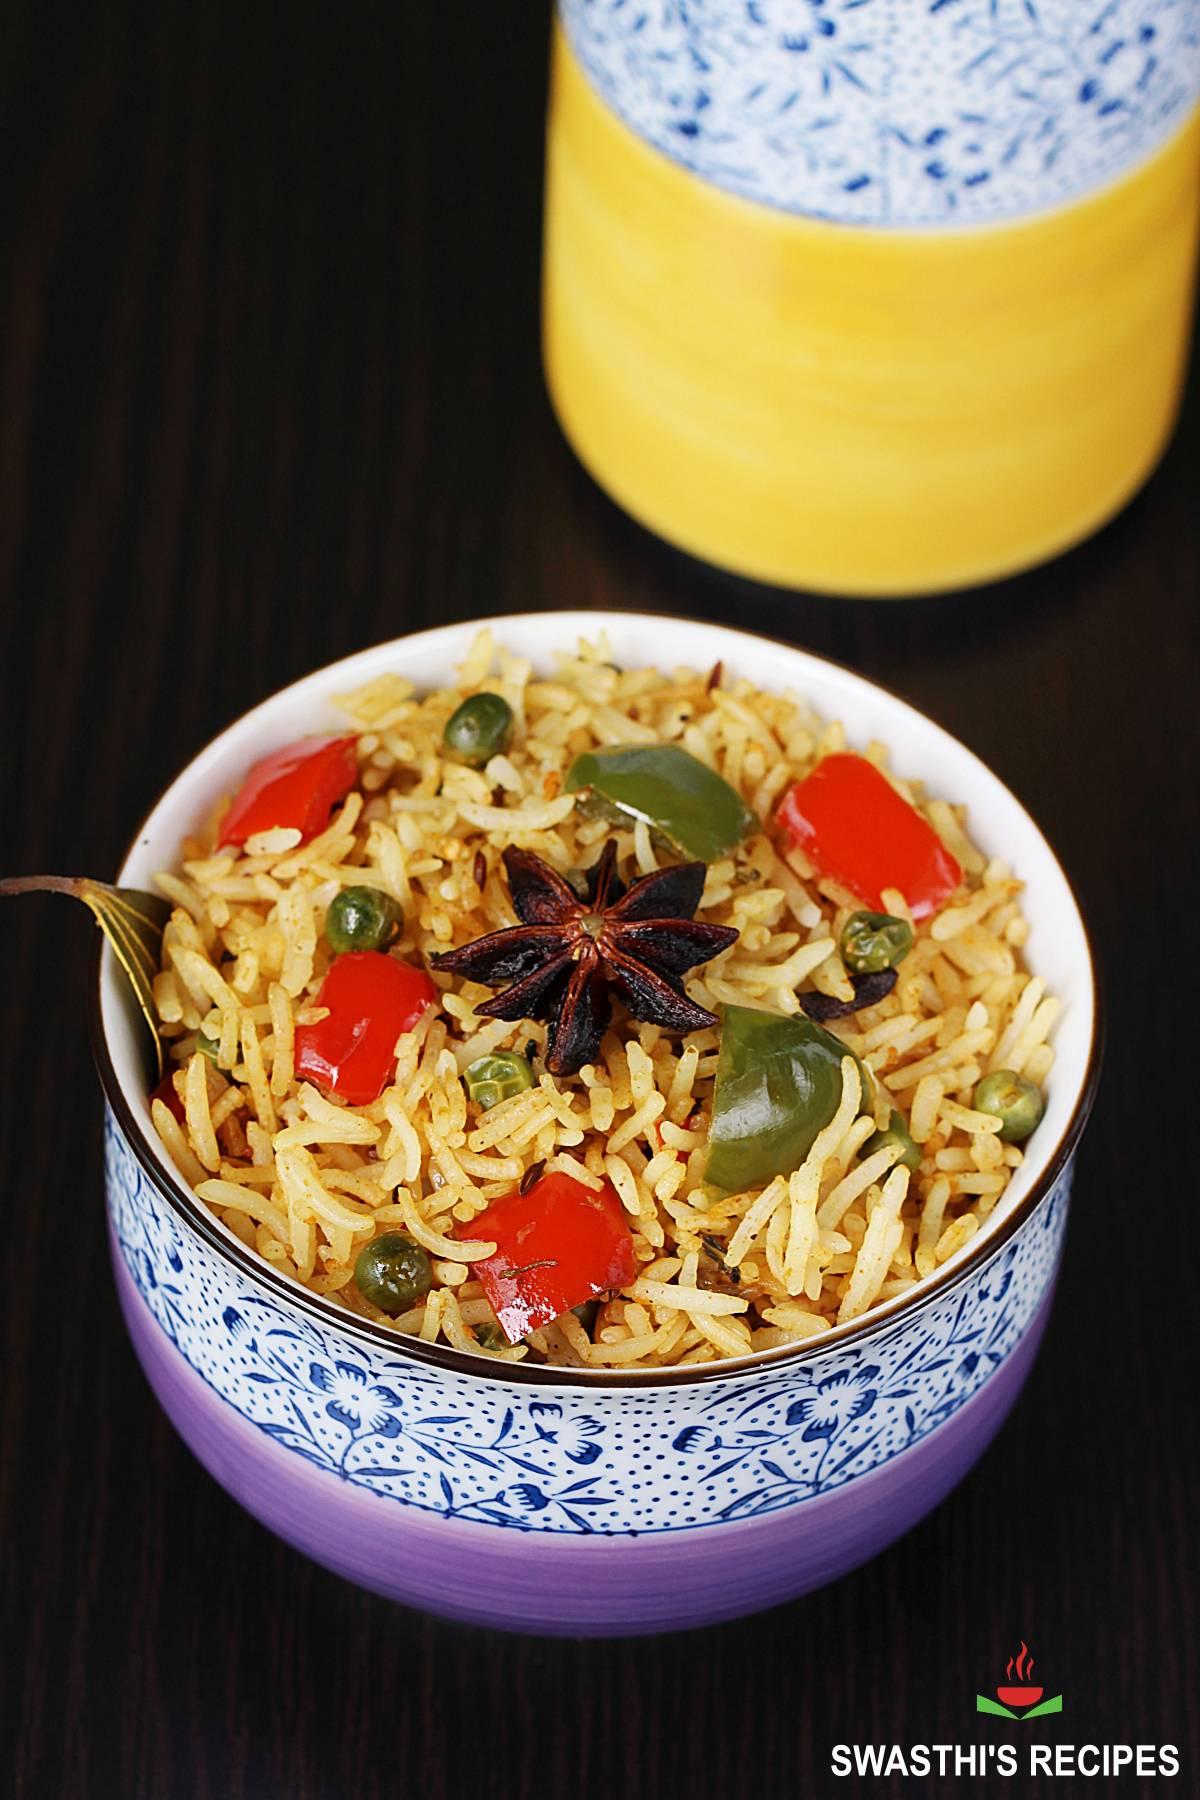 capsicum rice served in a bowl